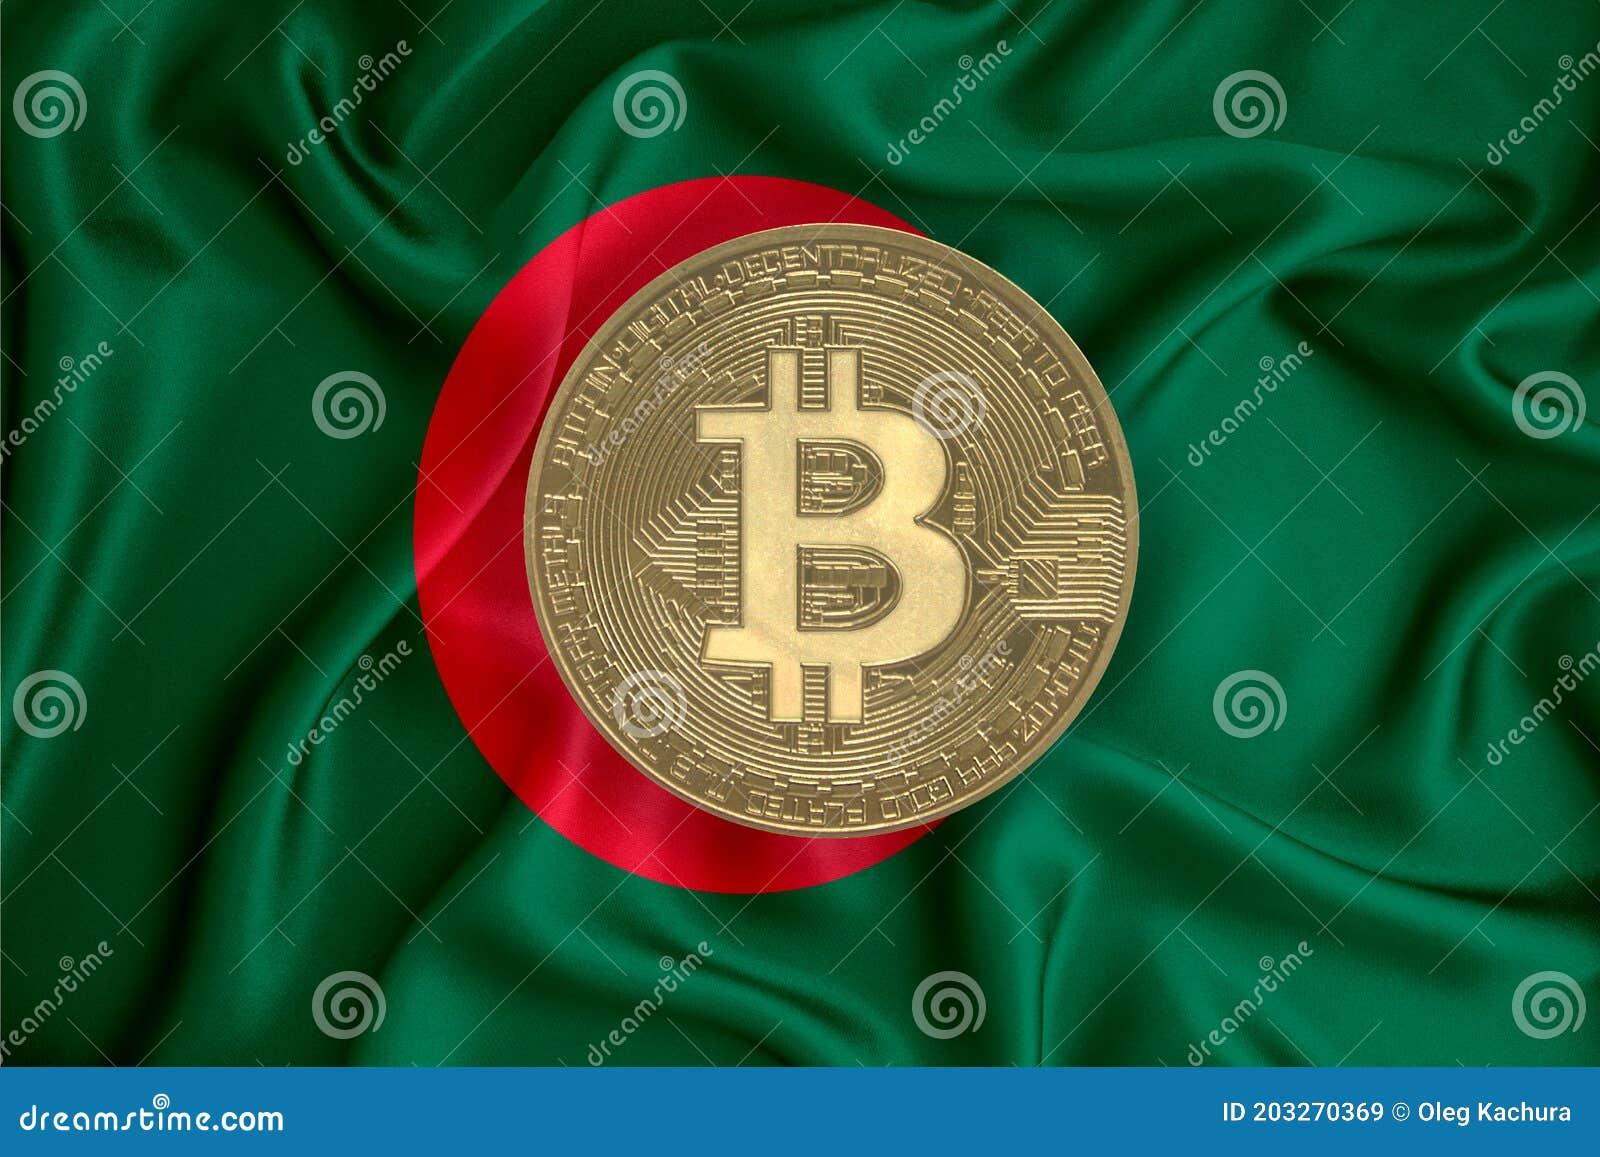 bitcoin exchange in bangladesh